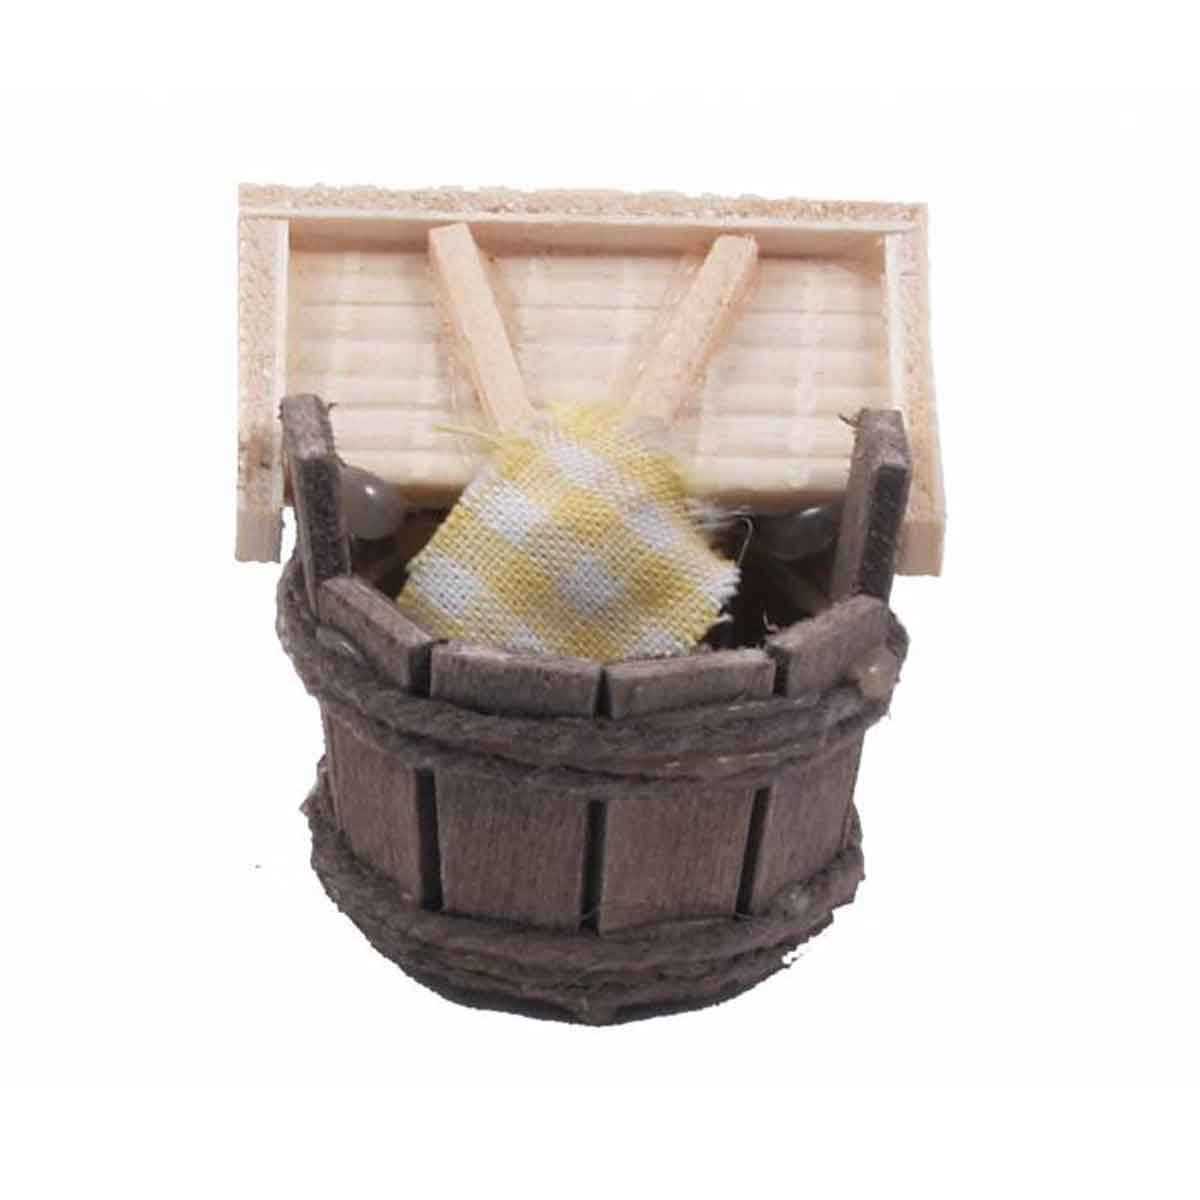 Presepe – Mastello con lavapanni